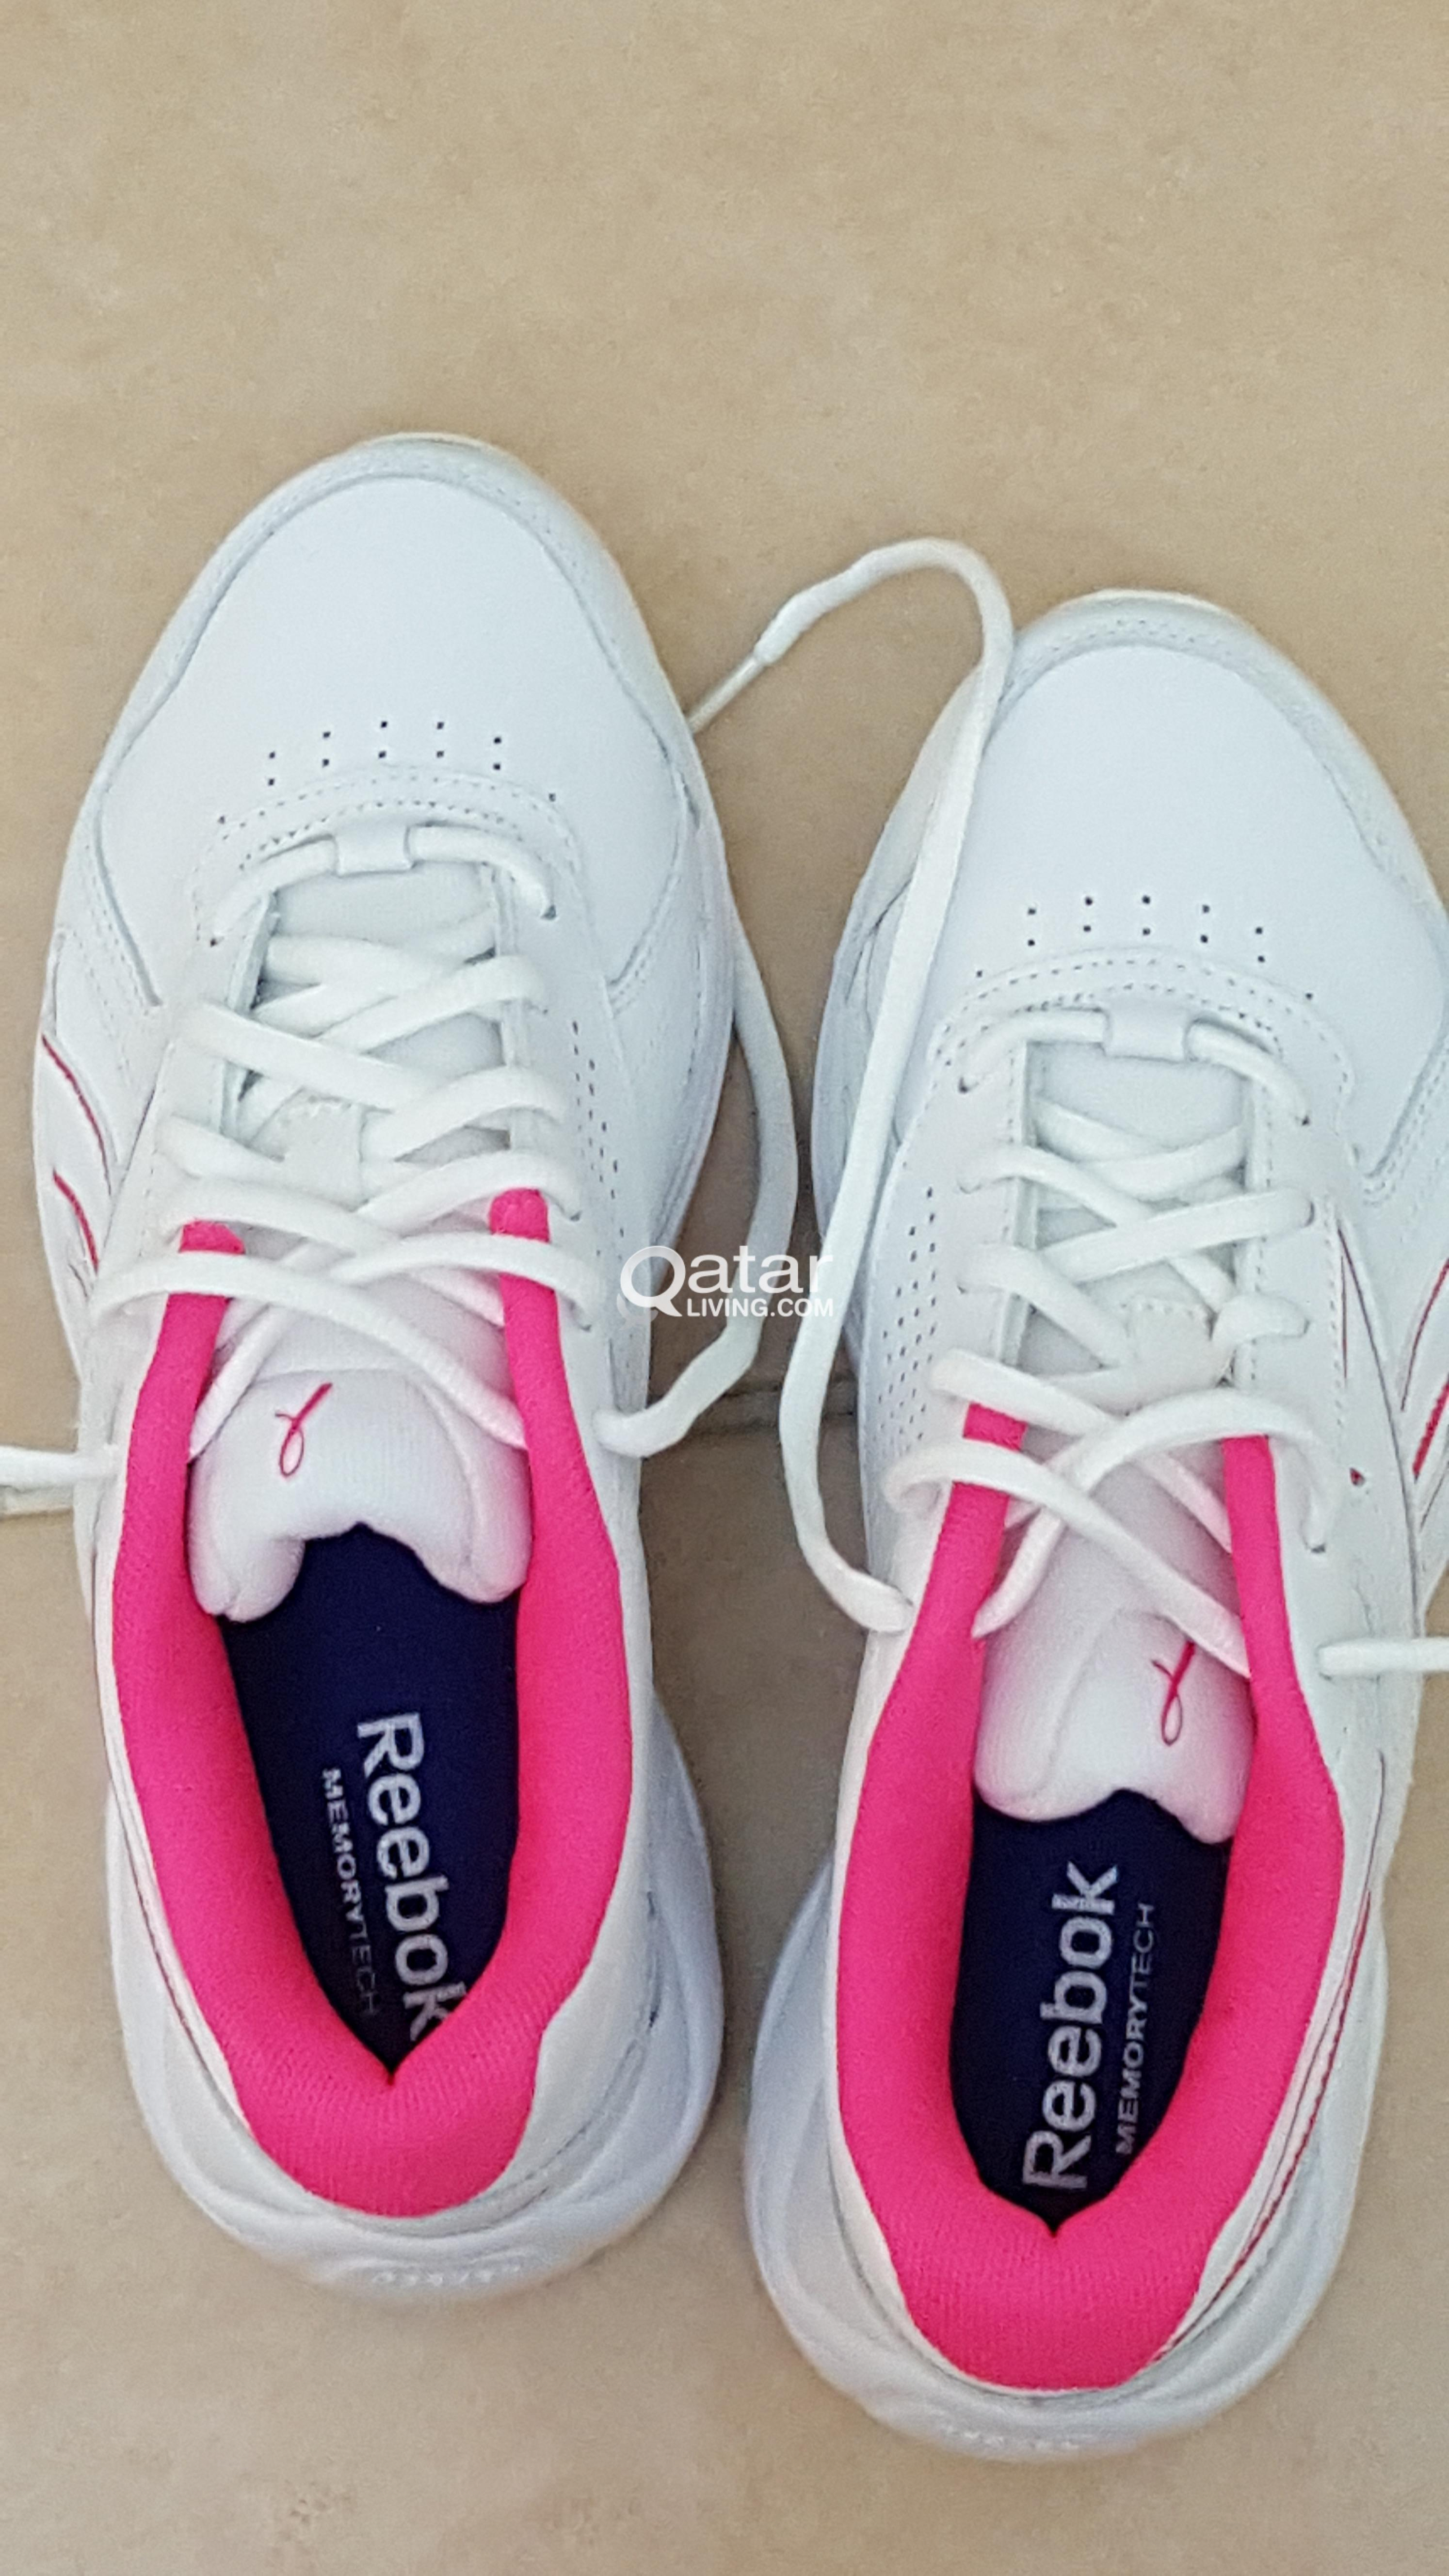 0b8849b05a2 Brand New Reebok Womens Ultra V Dmx Max White Walking Shoes Size 5.5 ...